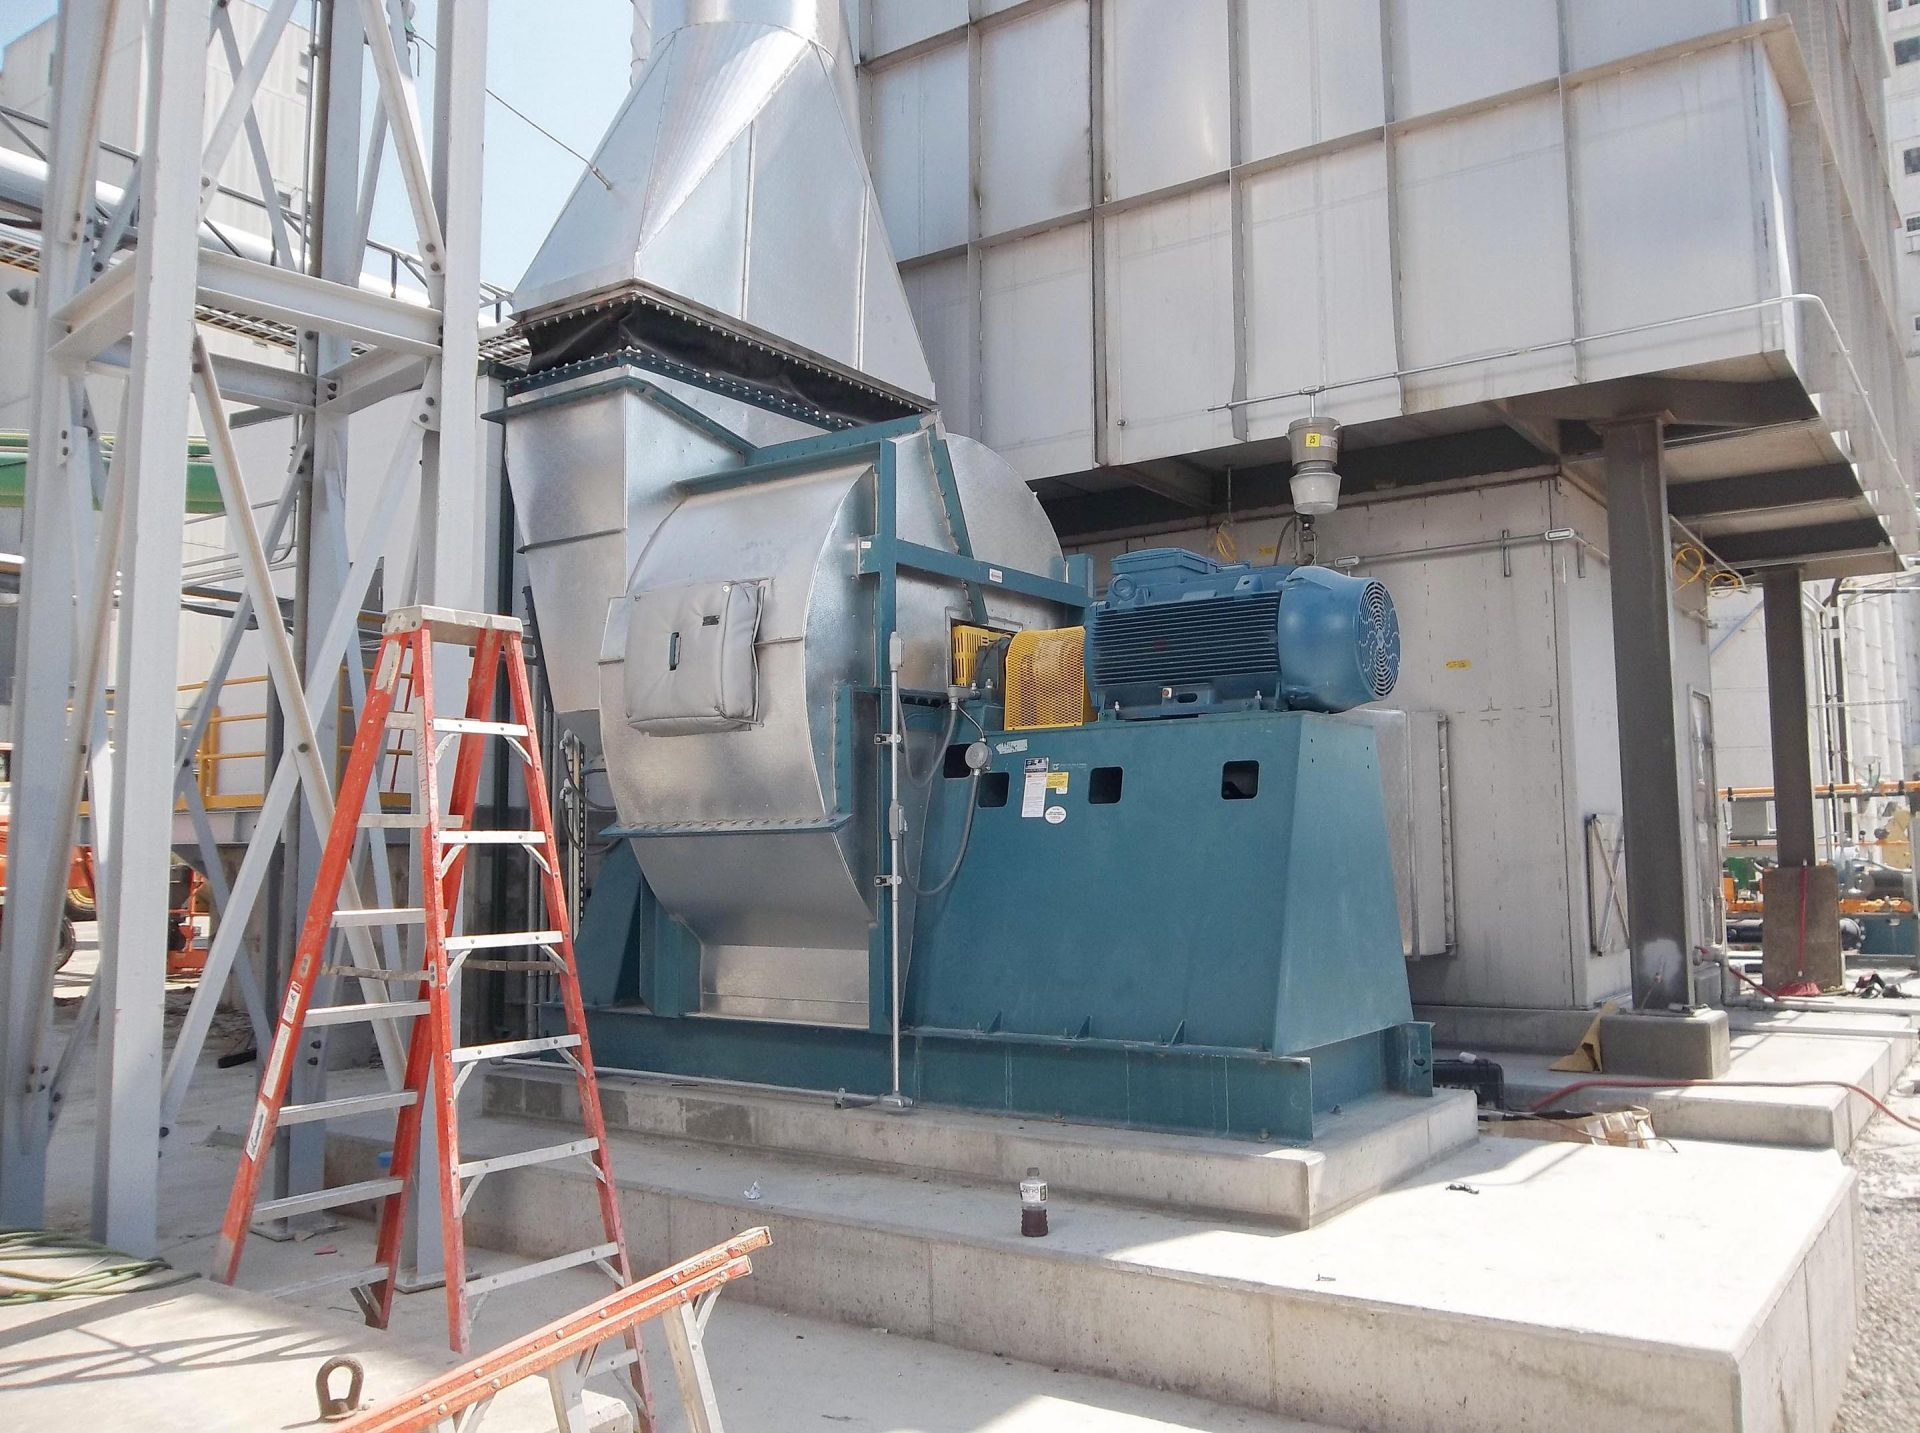 BCS - Regenerative Thermal Oxidizer